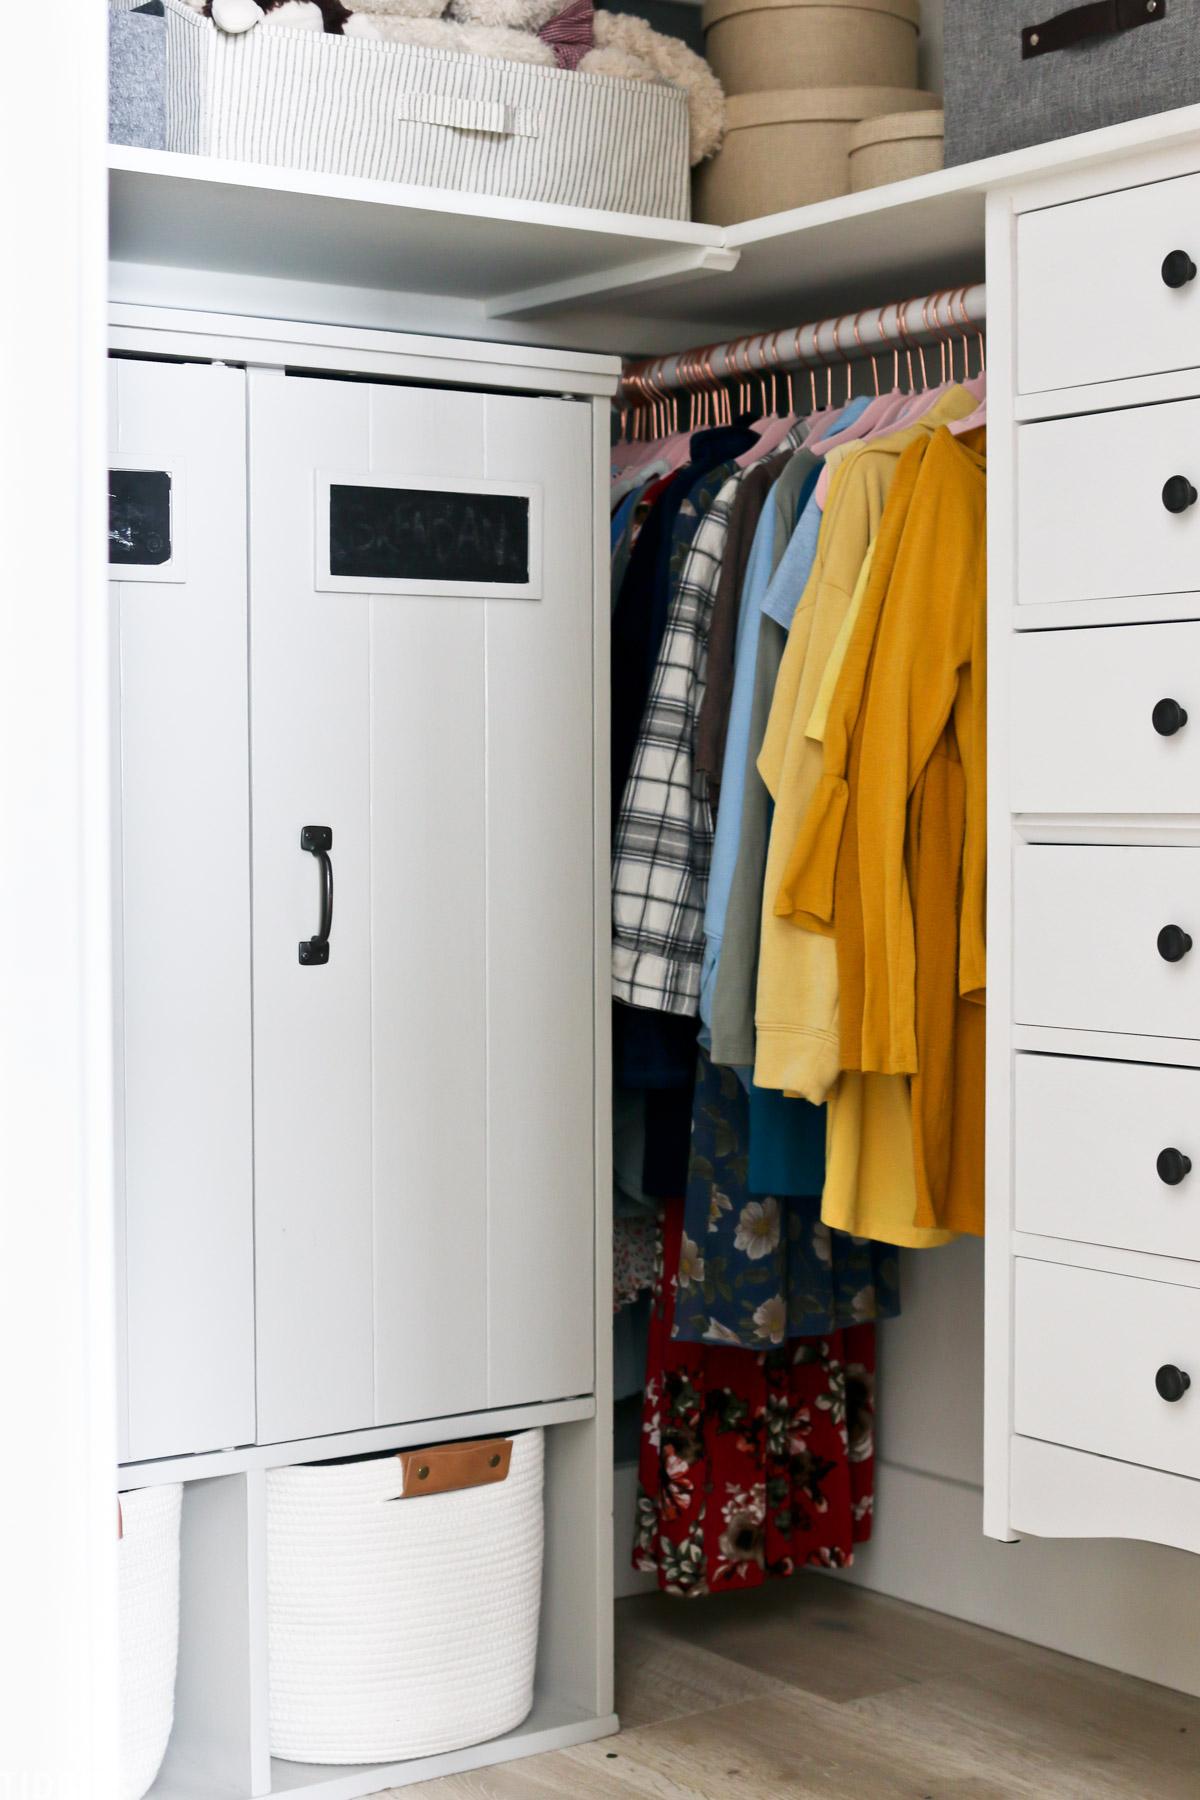 cupboards installed in a walk in kids closet